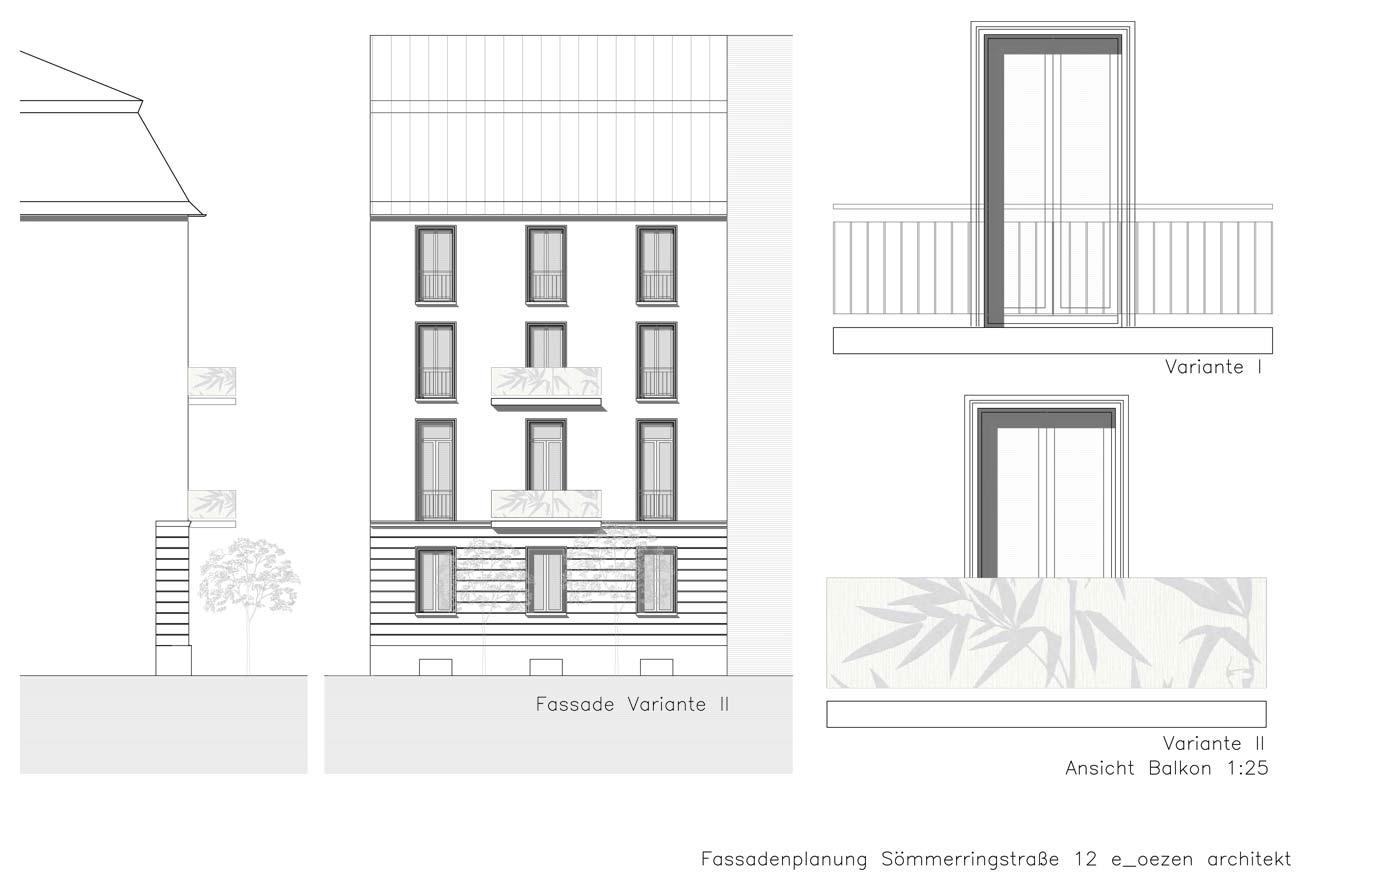 soemmeringstrasse-layout-1